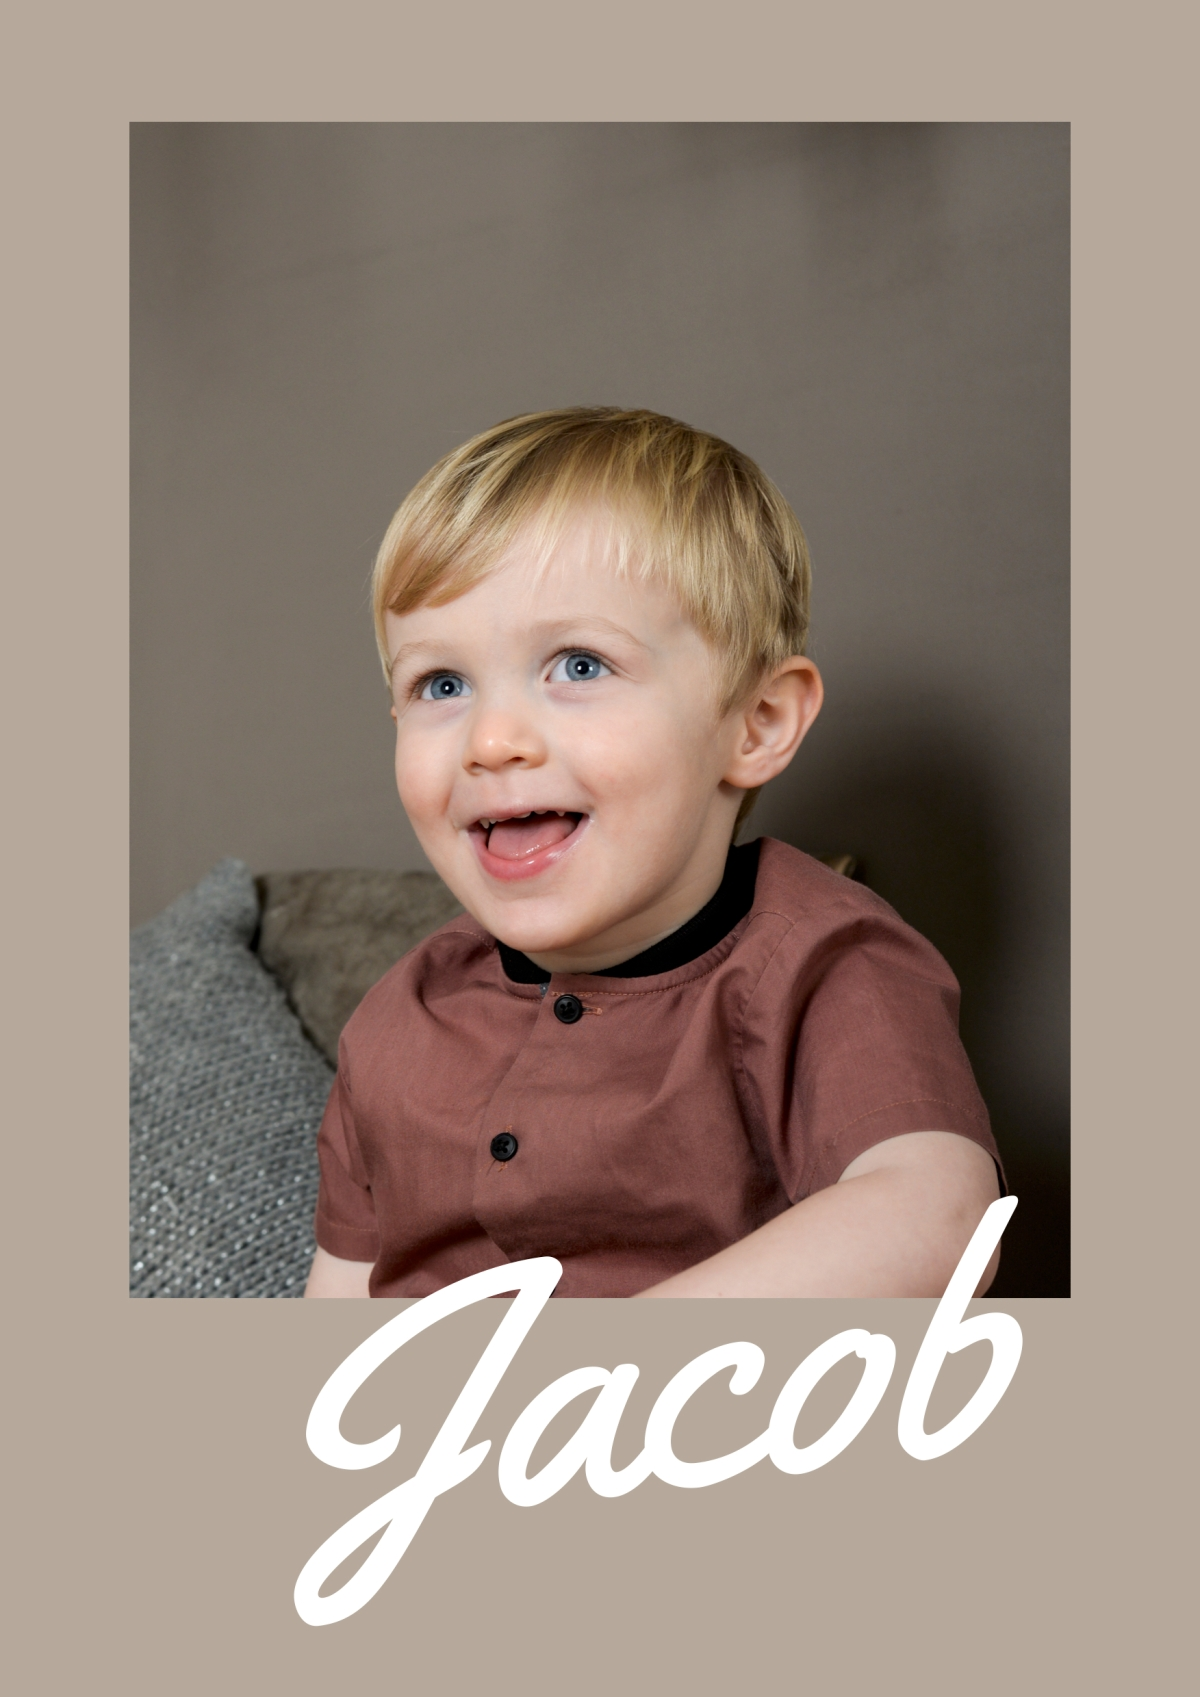 JacobLB